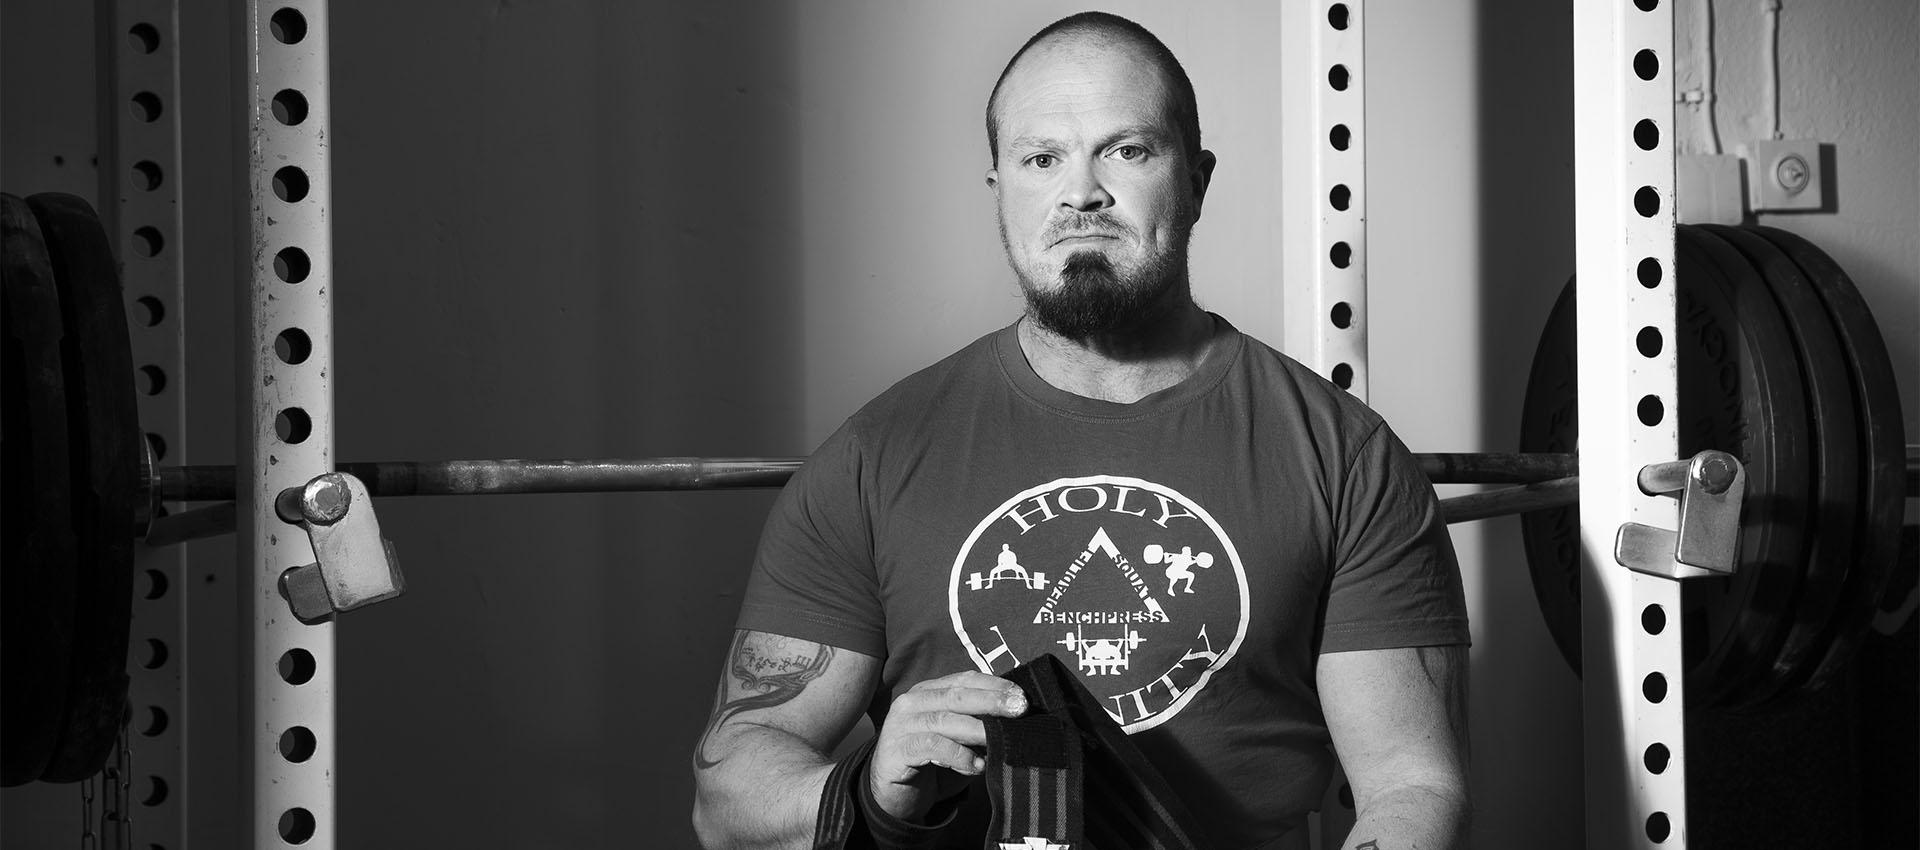 Personal trainer ja voimavalmentaja Mikko Korpeinen - Tampere